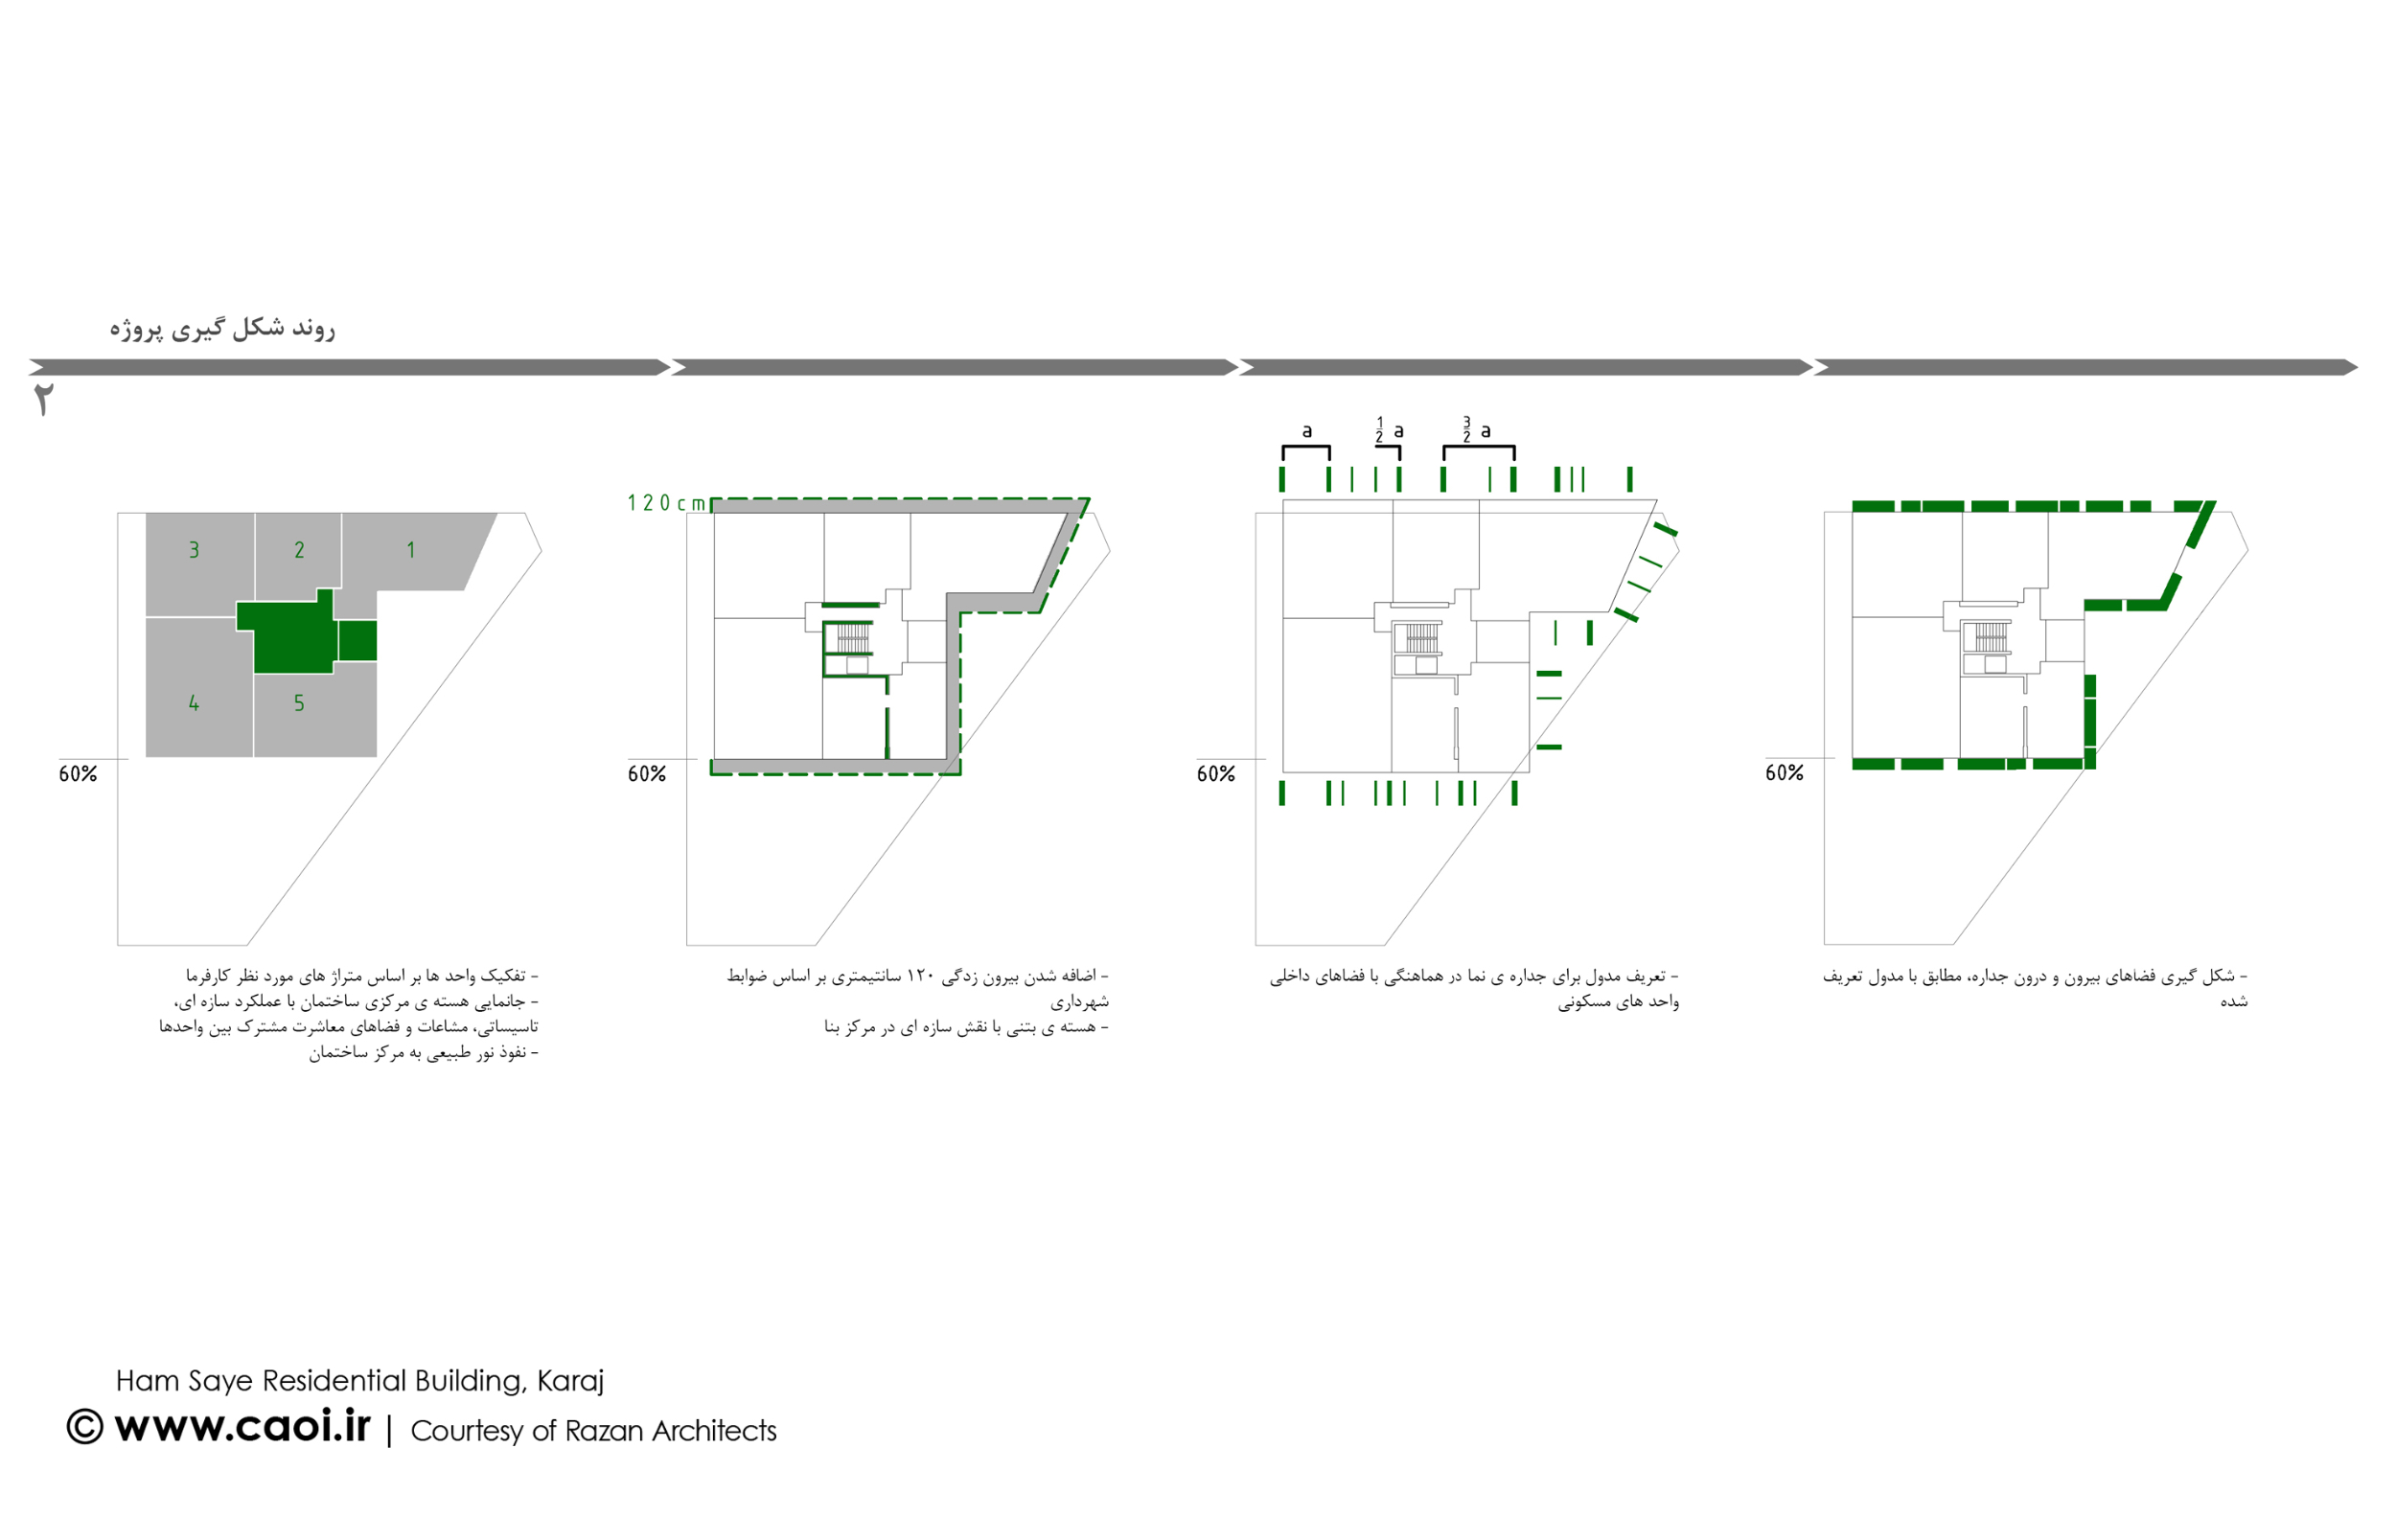 Ham_Saye_Residential_Building_in_Karaj_by_Razan_Architects_Diagrams__2_